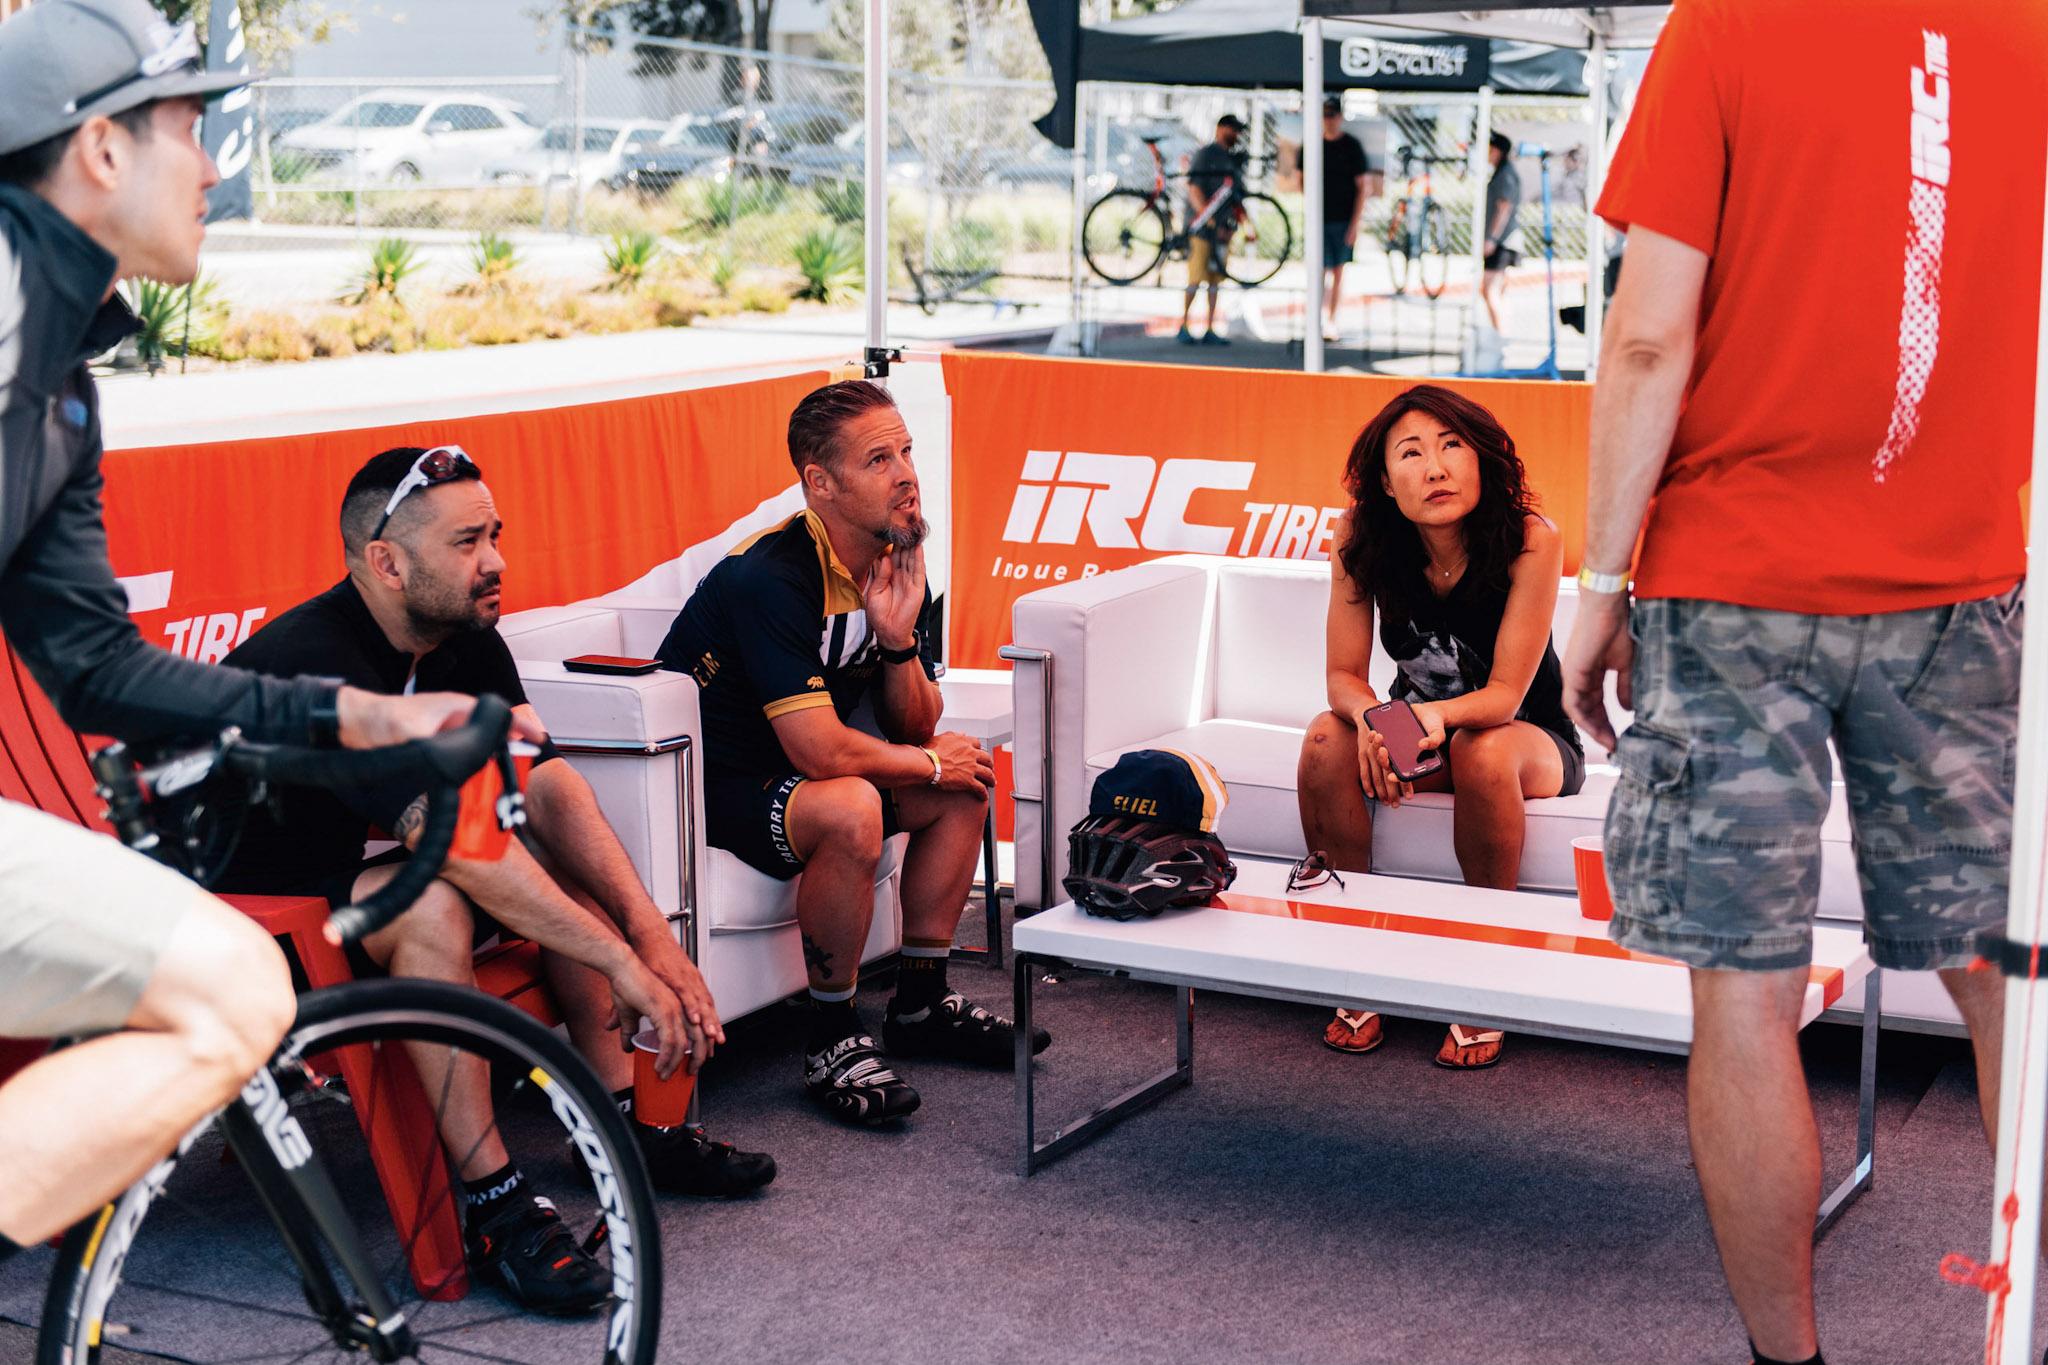 Marc Chilcote, an Eliel Factory Team rider,rethinking his use of a Focus Ravan MTB on race day.